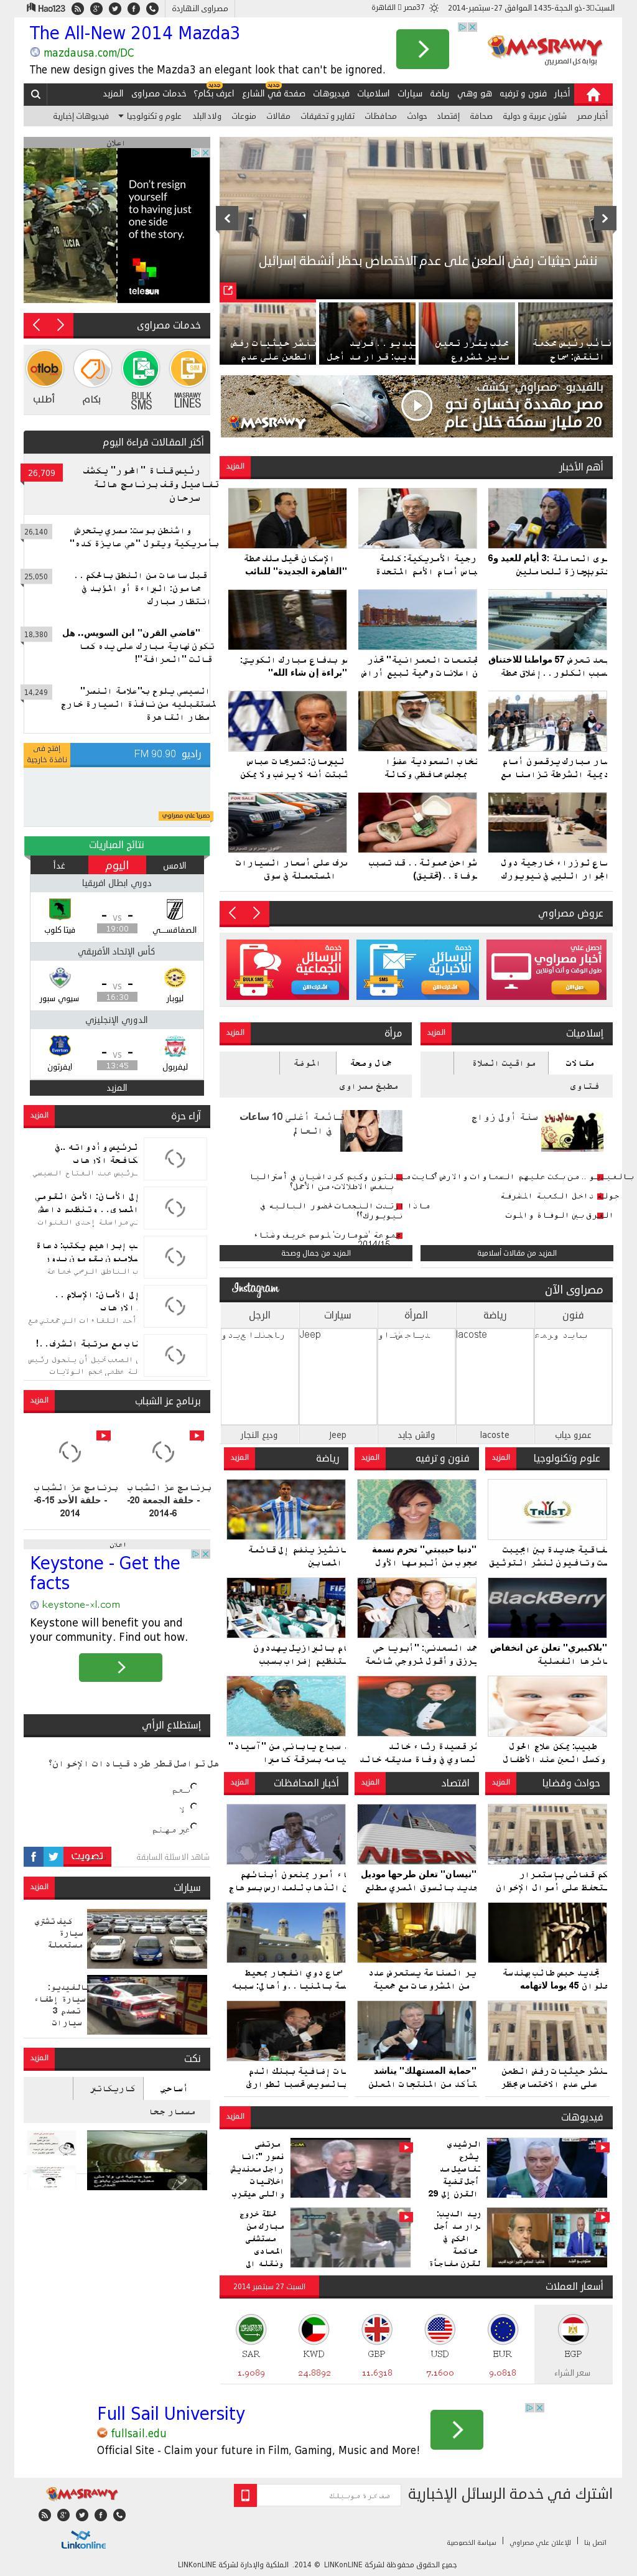 Masrawy at Saturday Sept. 27, 2014, 11:08 a.m. UTC